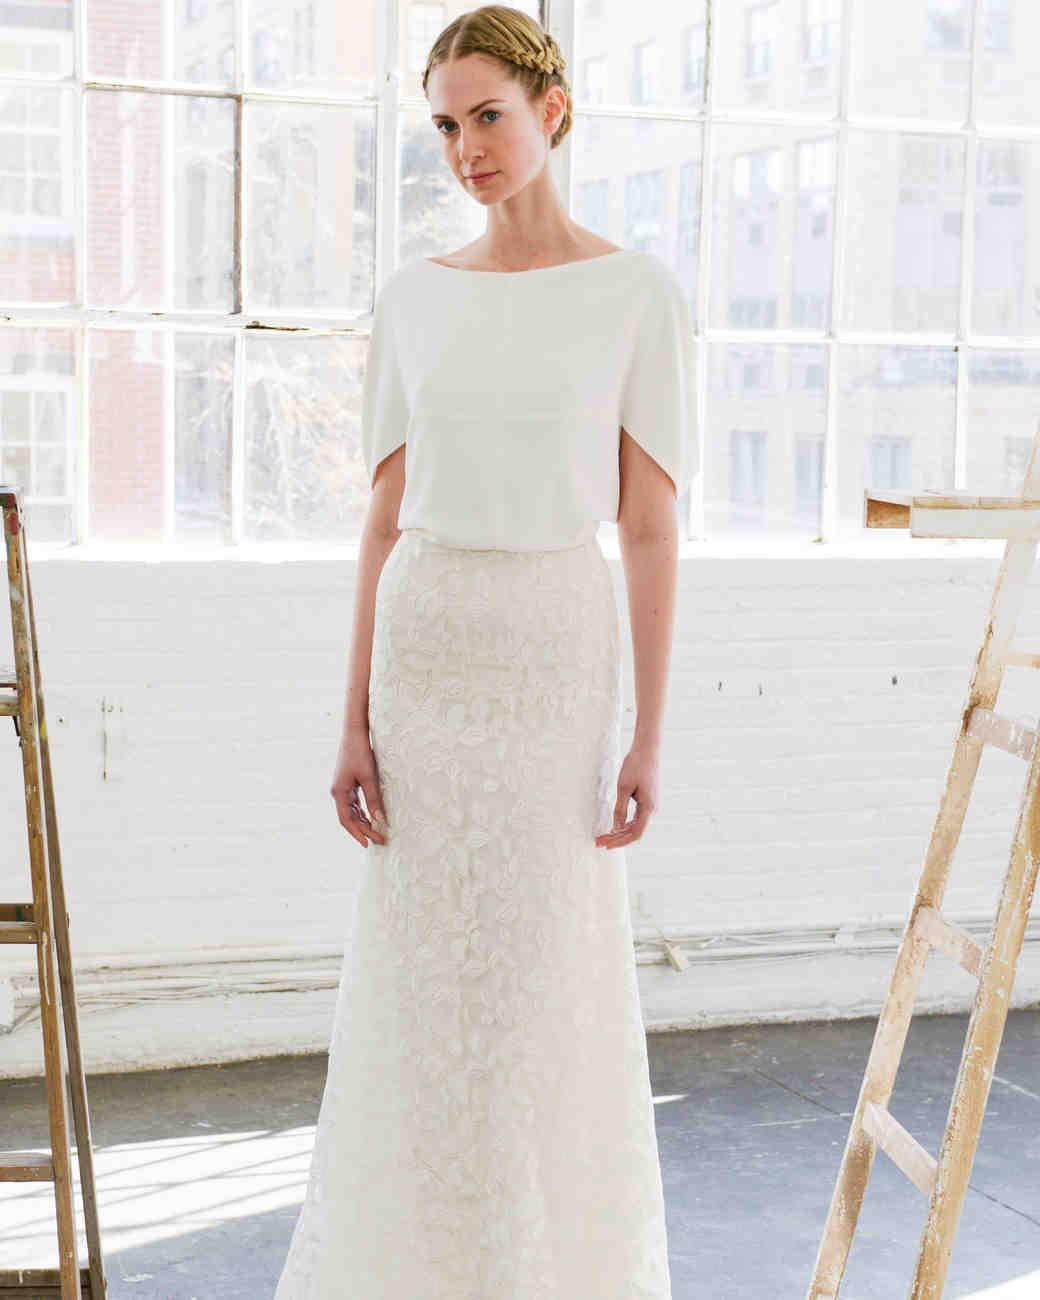 Marchesa Spring 2017 Wedding Dress Collection: Lela Rose Spring 2017 Wedding Dress Collection